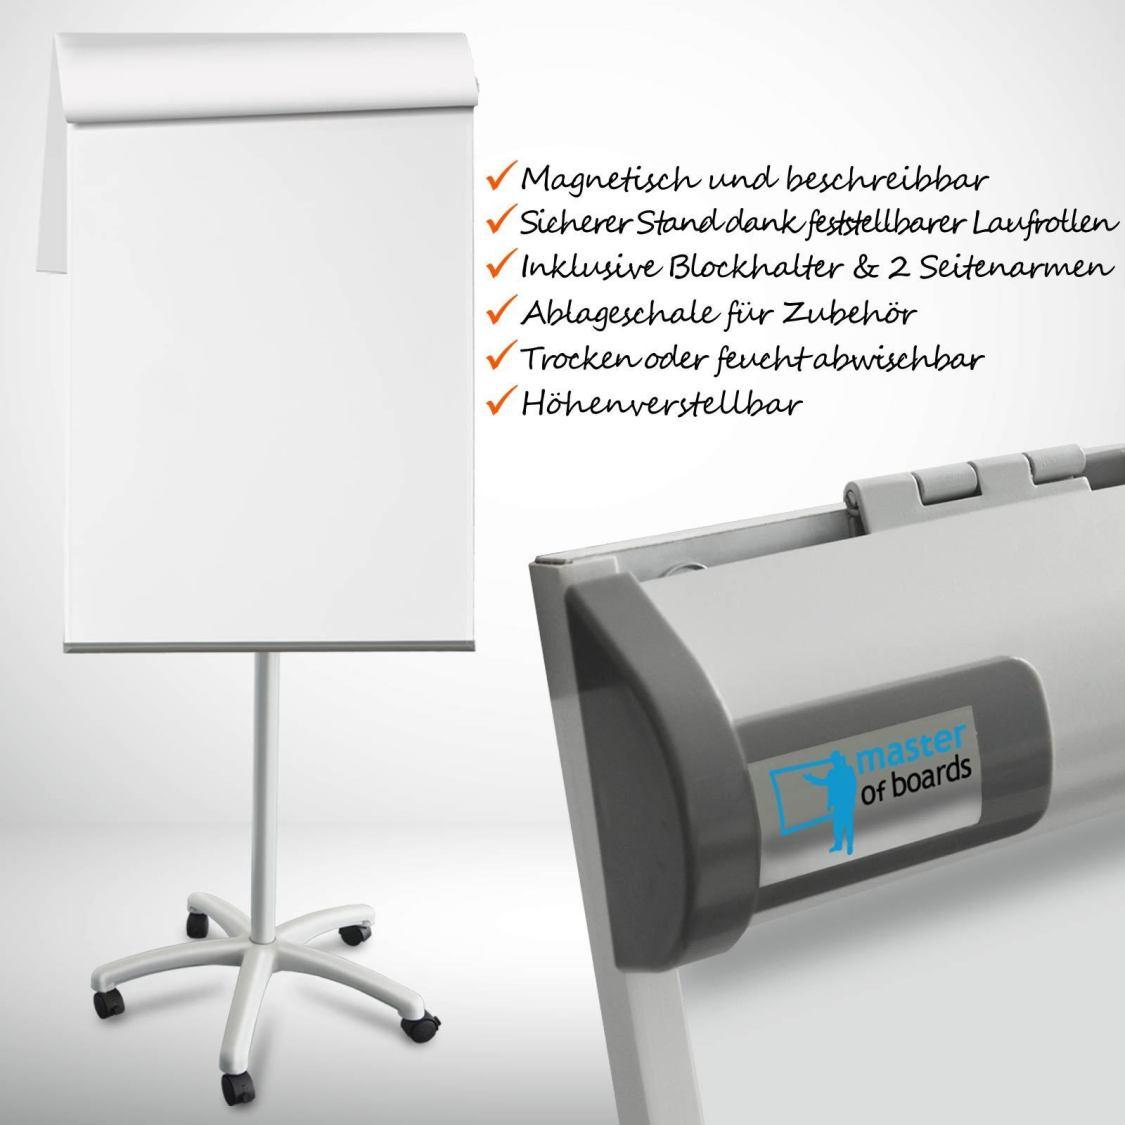 Flipchart Piranha | Rollenfuß Sternfuß Witeboard Weisswandtafel Mobil Flip Chart